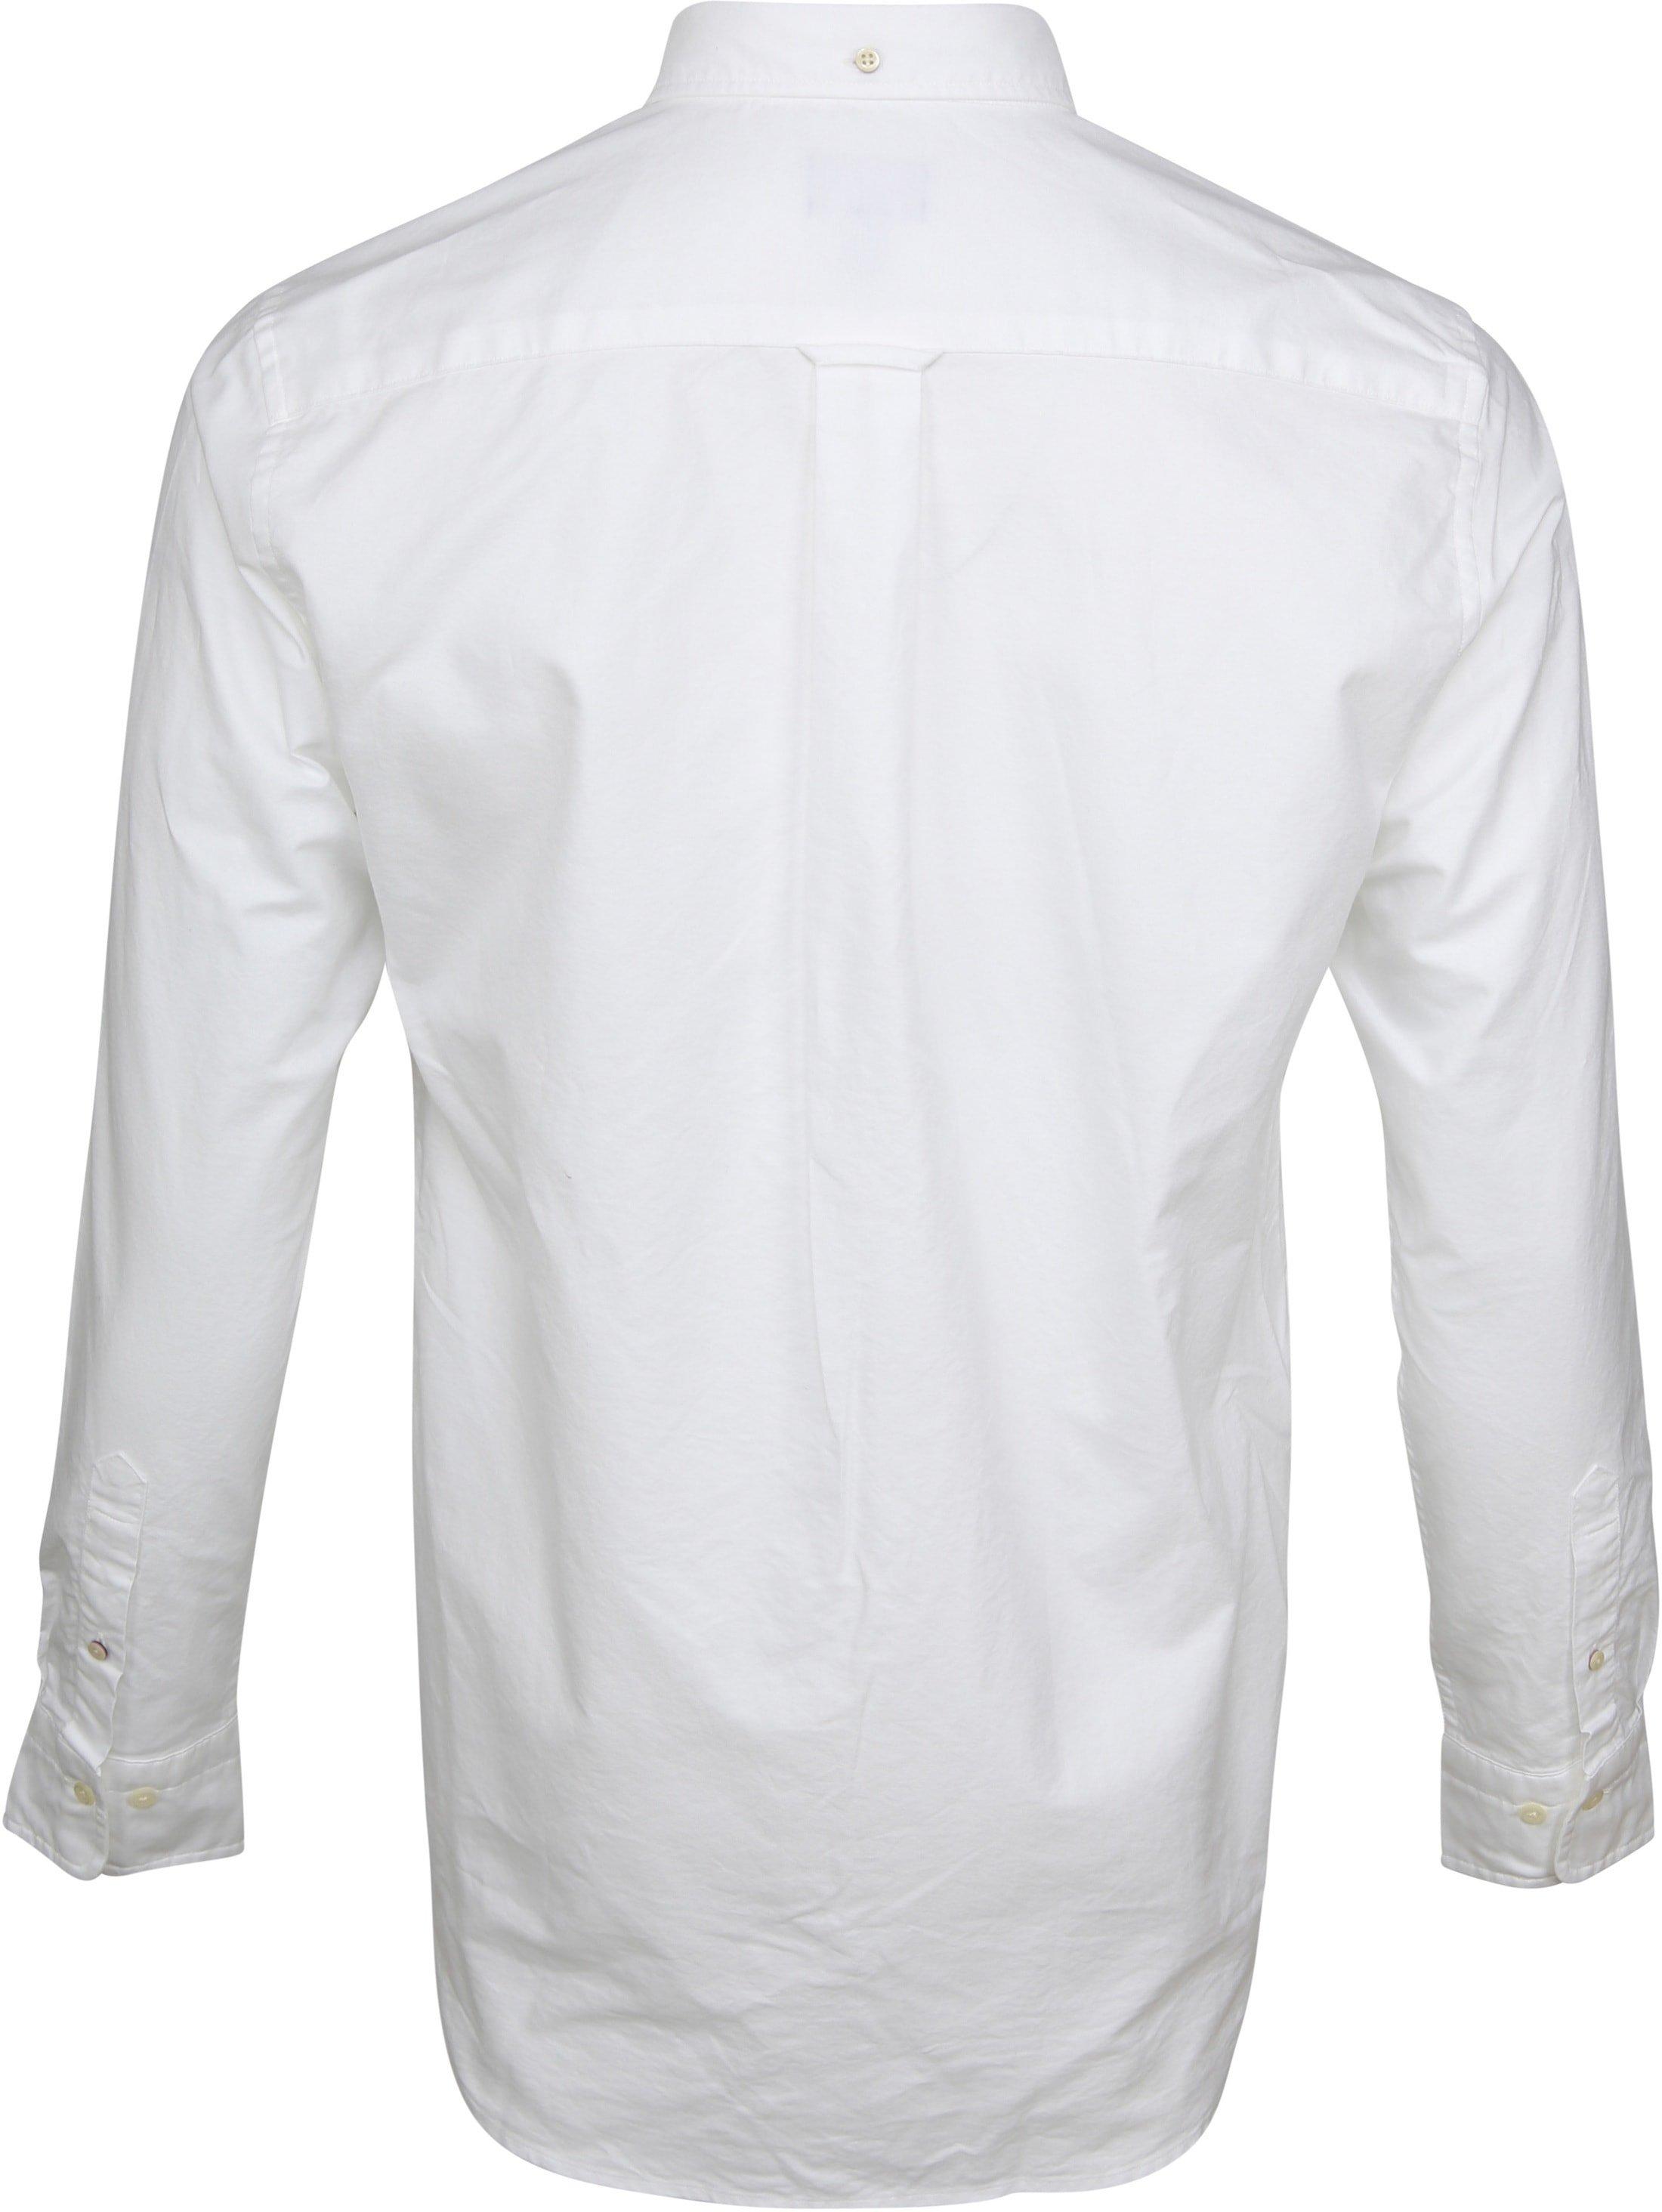 Gant Casual Shirt Oxford White foto 3